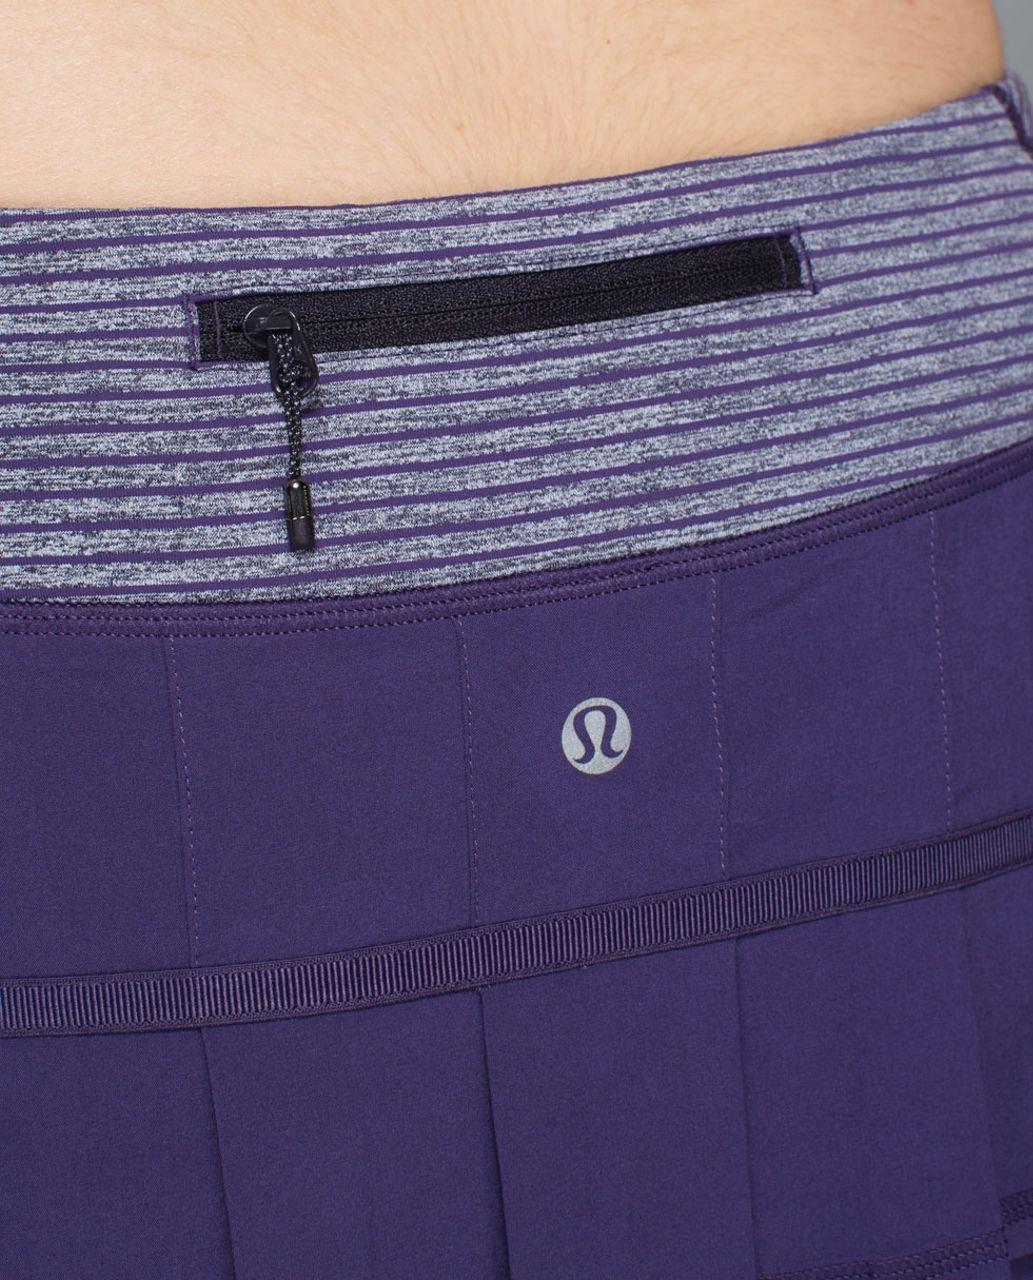 Lululemon Run:  Pace Setter Skirt *4-way Stretch (Regular) - Going Grape / Hyper Stripe Heathered Black Grape Going Grape